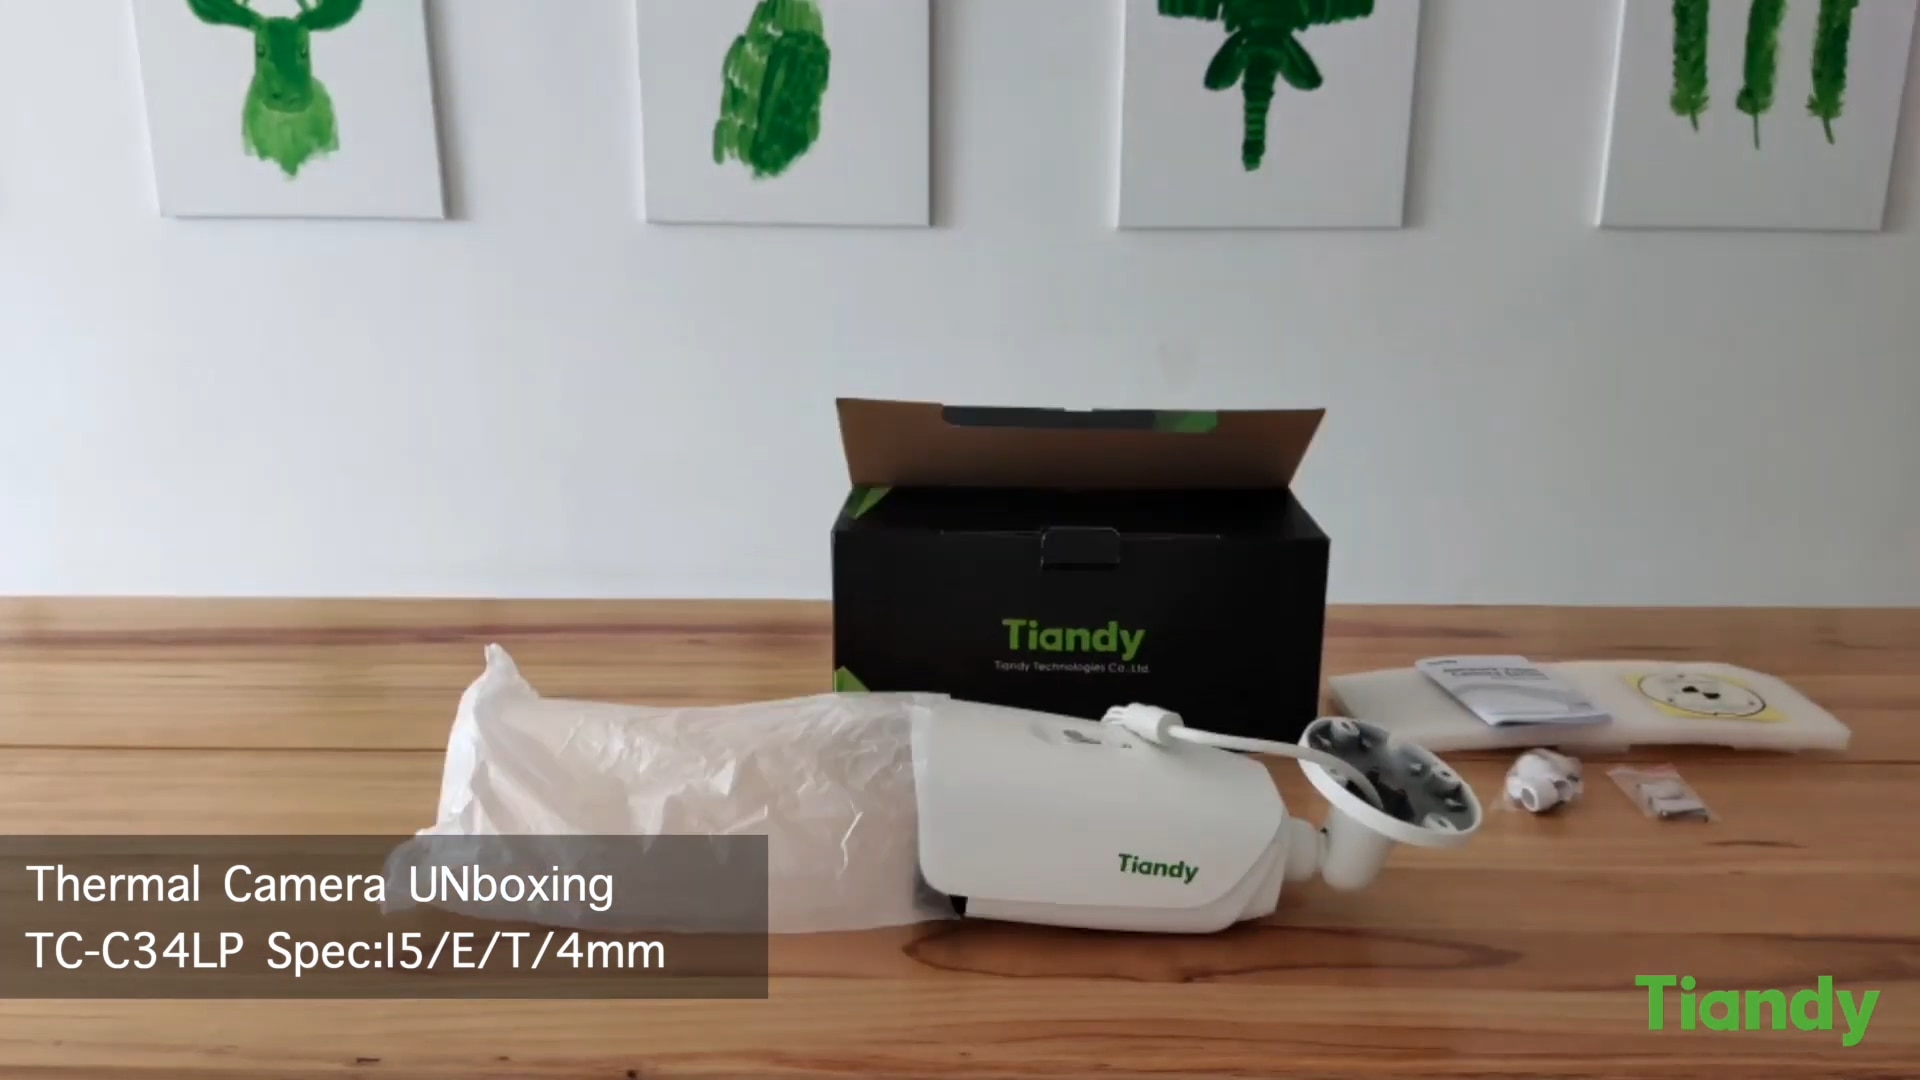 Tiandy-كاميرا 12 ميجابكسل IR ، كشف الحركة ، تصنيف المركبات ، 4K